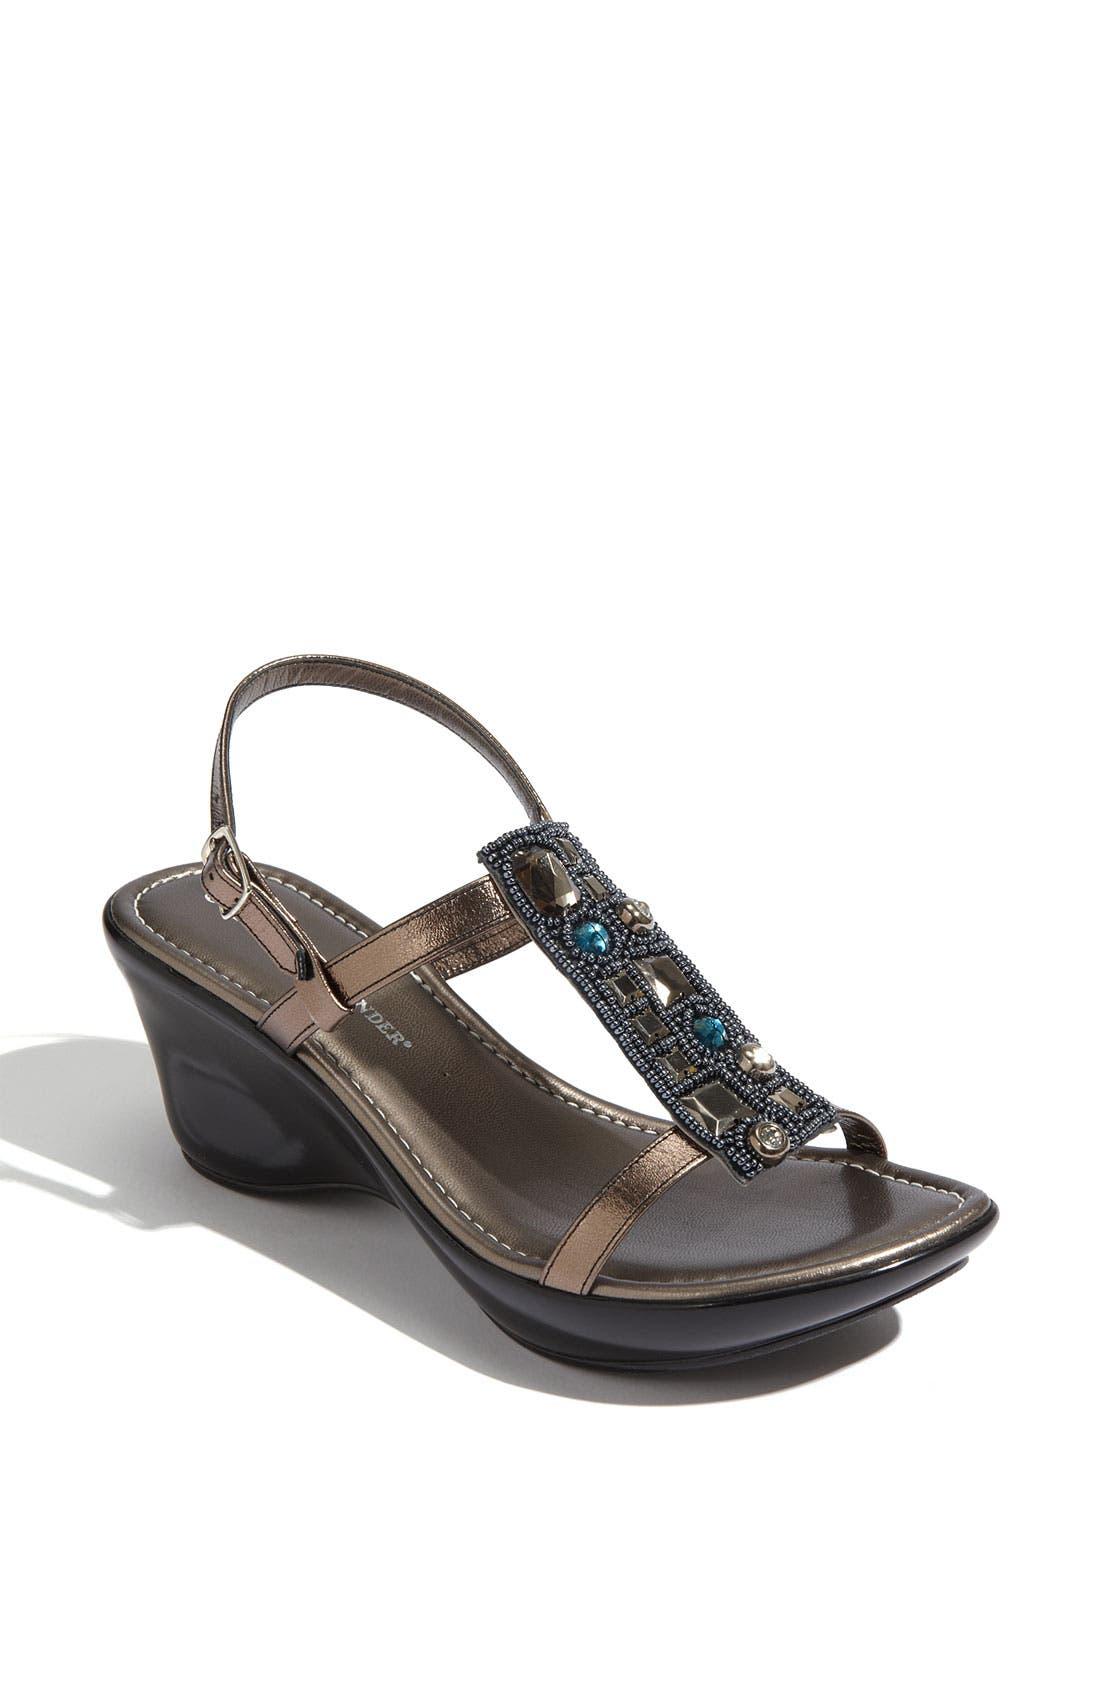 Alternate Image 1 Selected - Athena Alexander 'Marina' Sandal